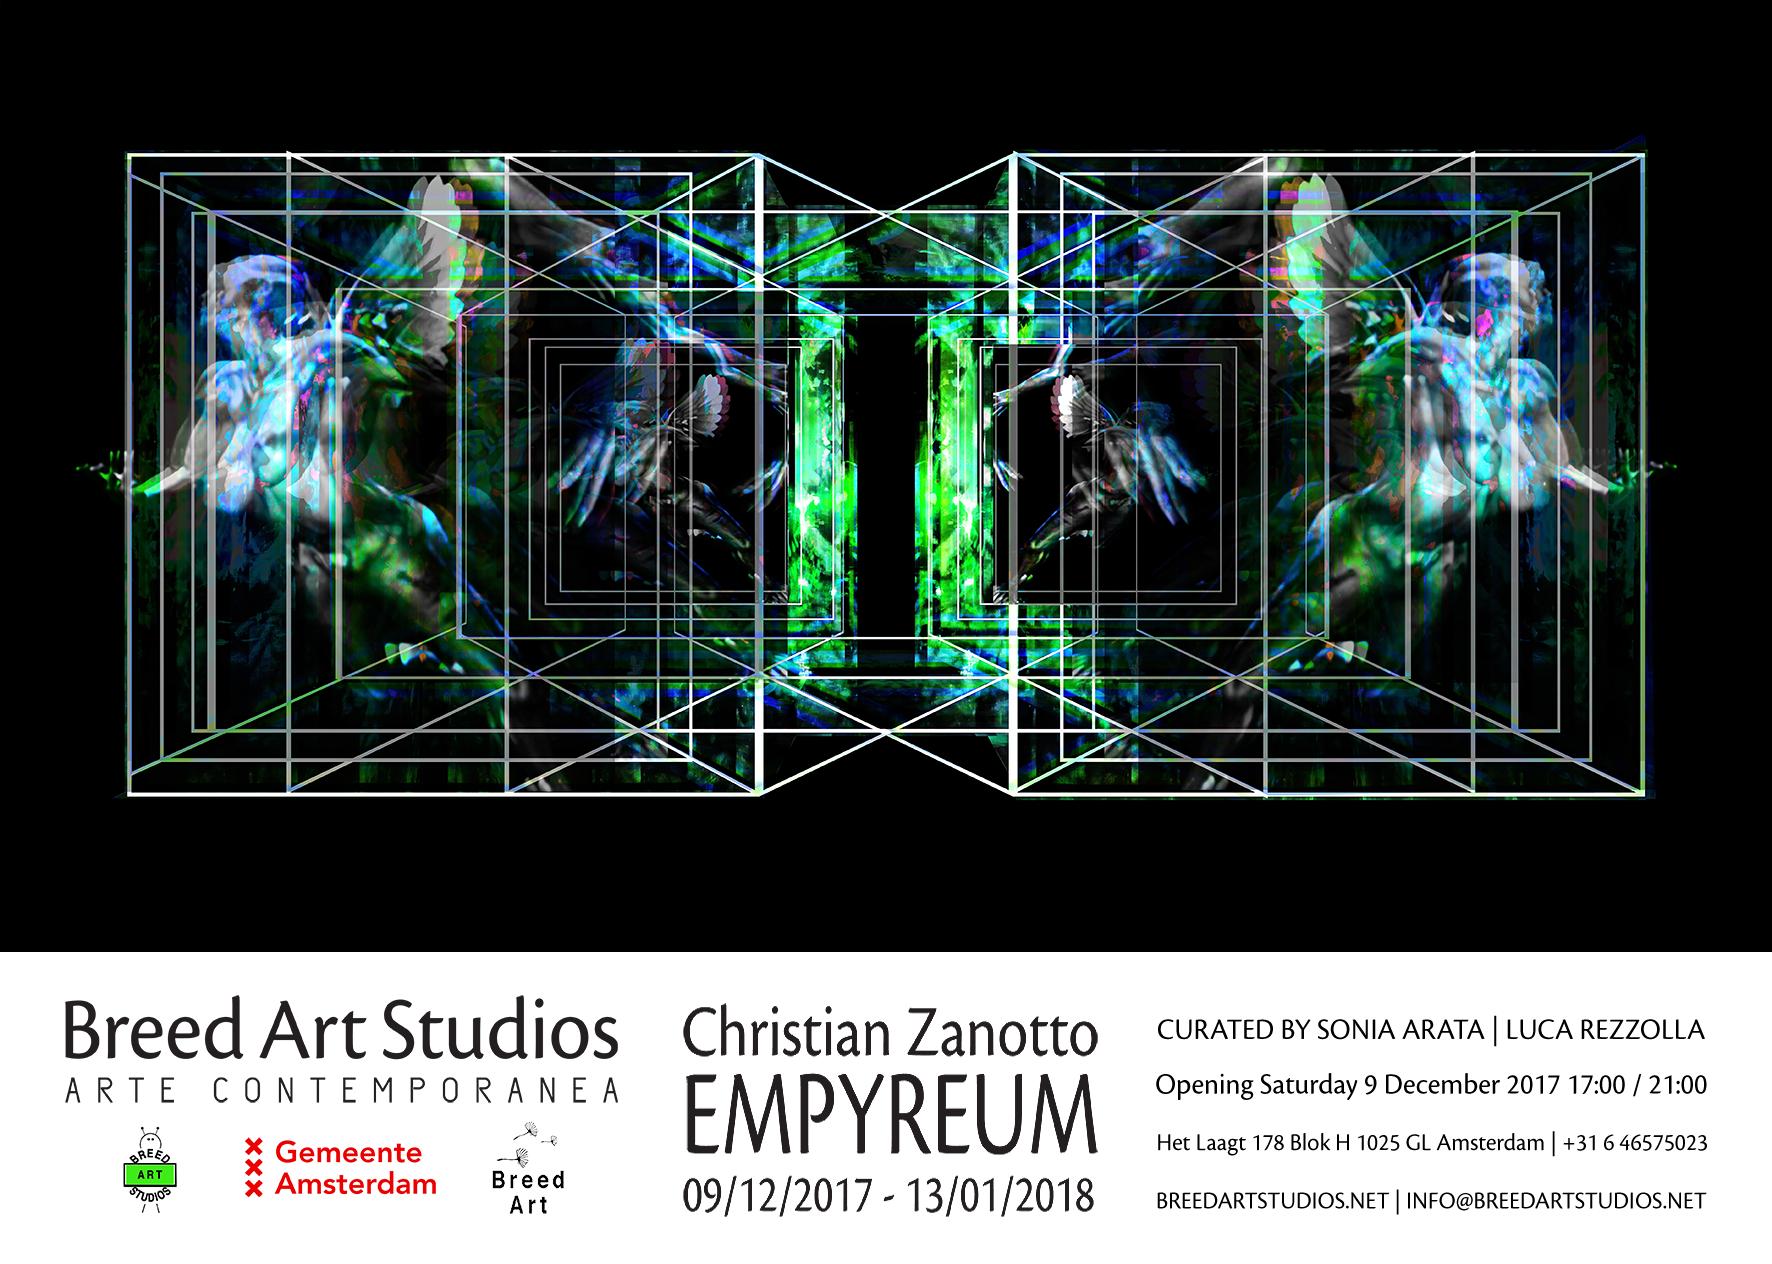 Opening Tentoonstelling: Christian Zanotto 'EMPYREUM'